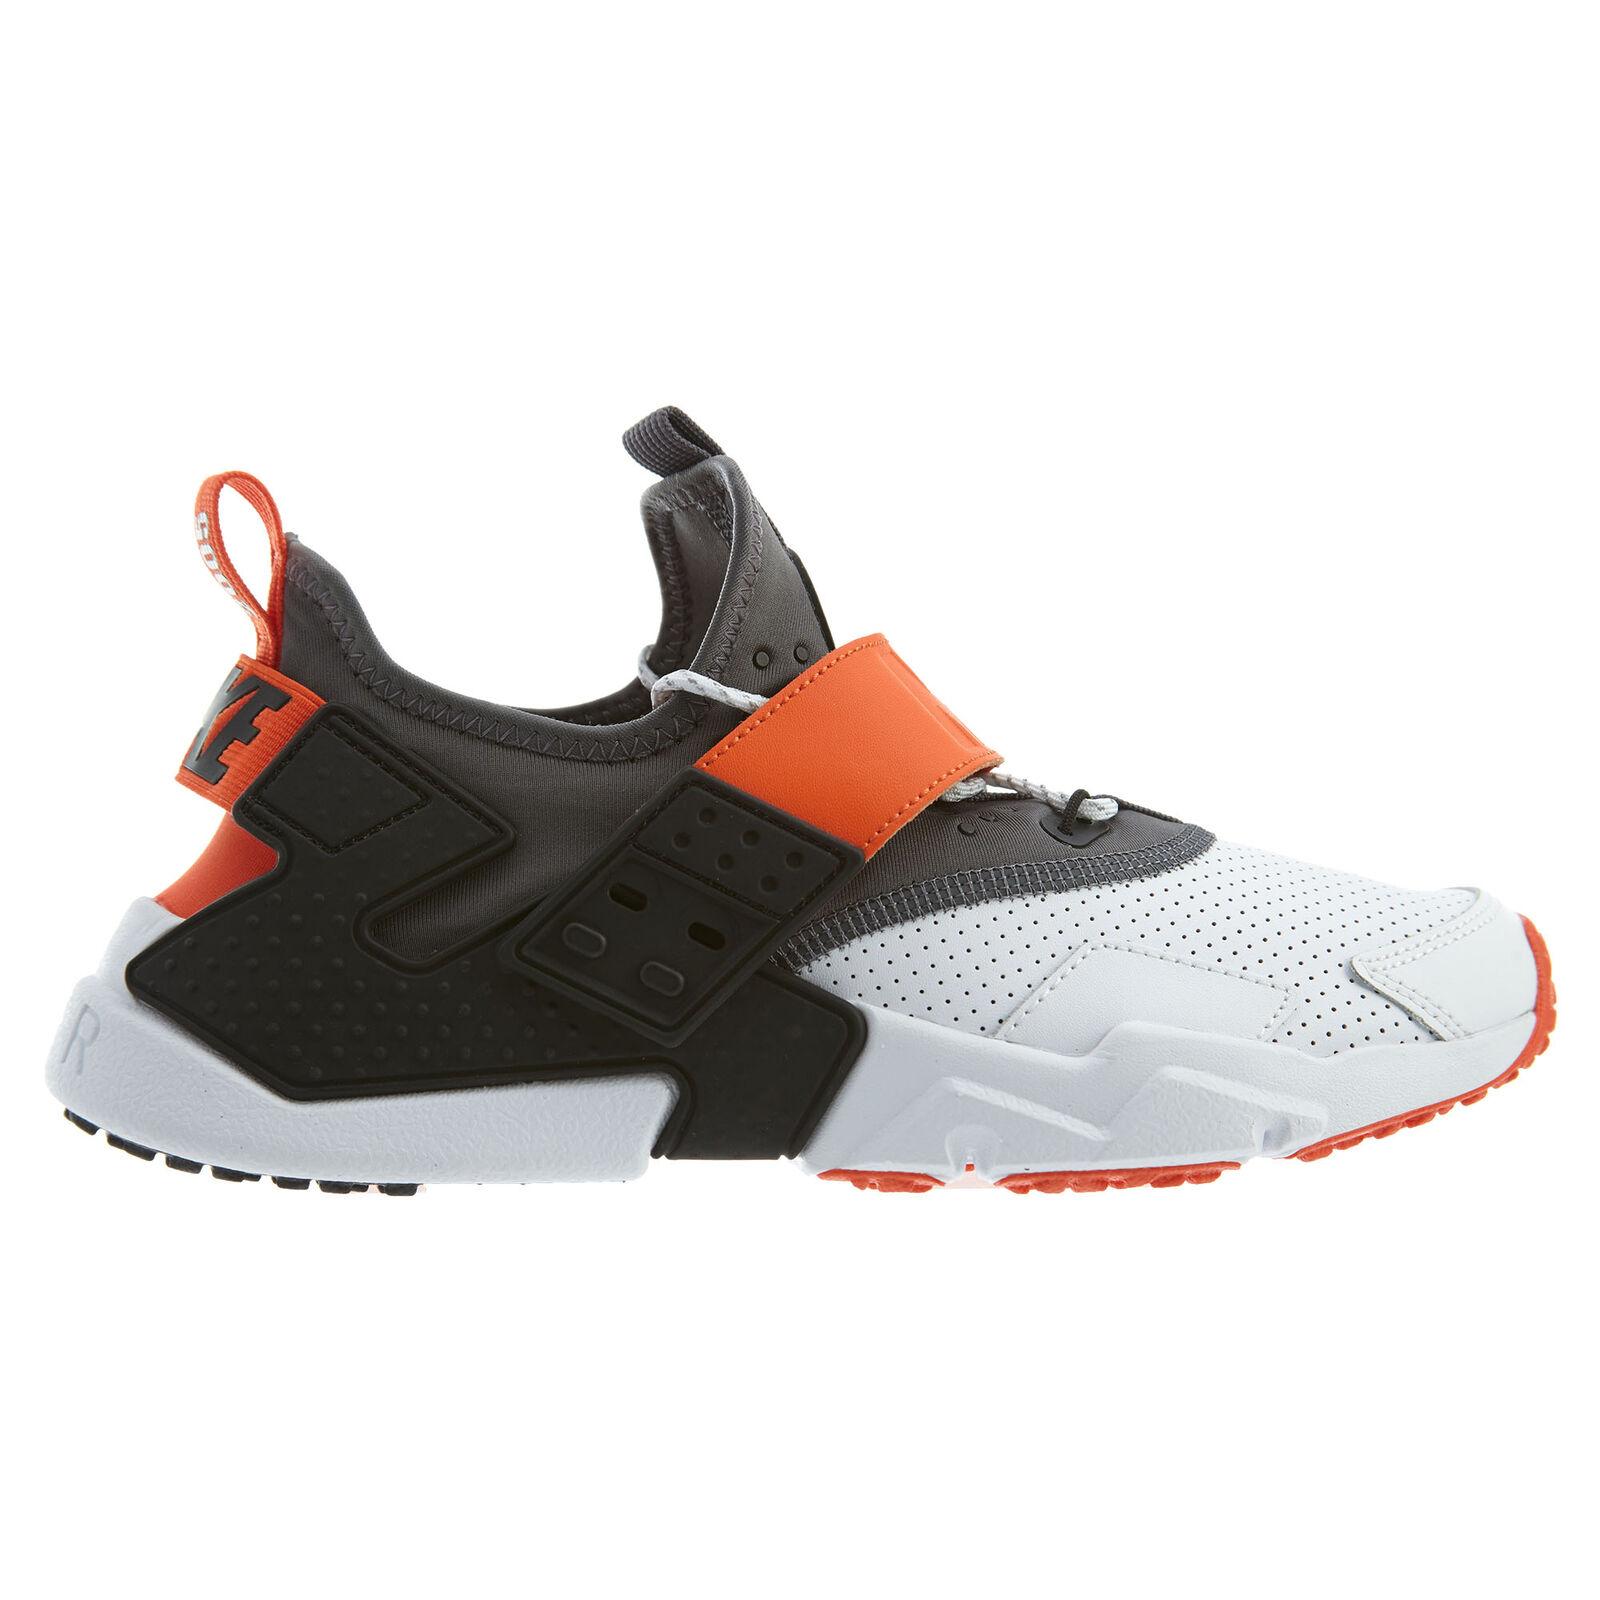 5666a0addf Nike Air Huarache Drift AH7335-102 White Grey orange shoes Size 7.5 Premium  Mens ntifcr124-Athletic Shoes